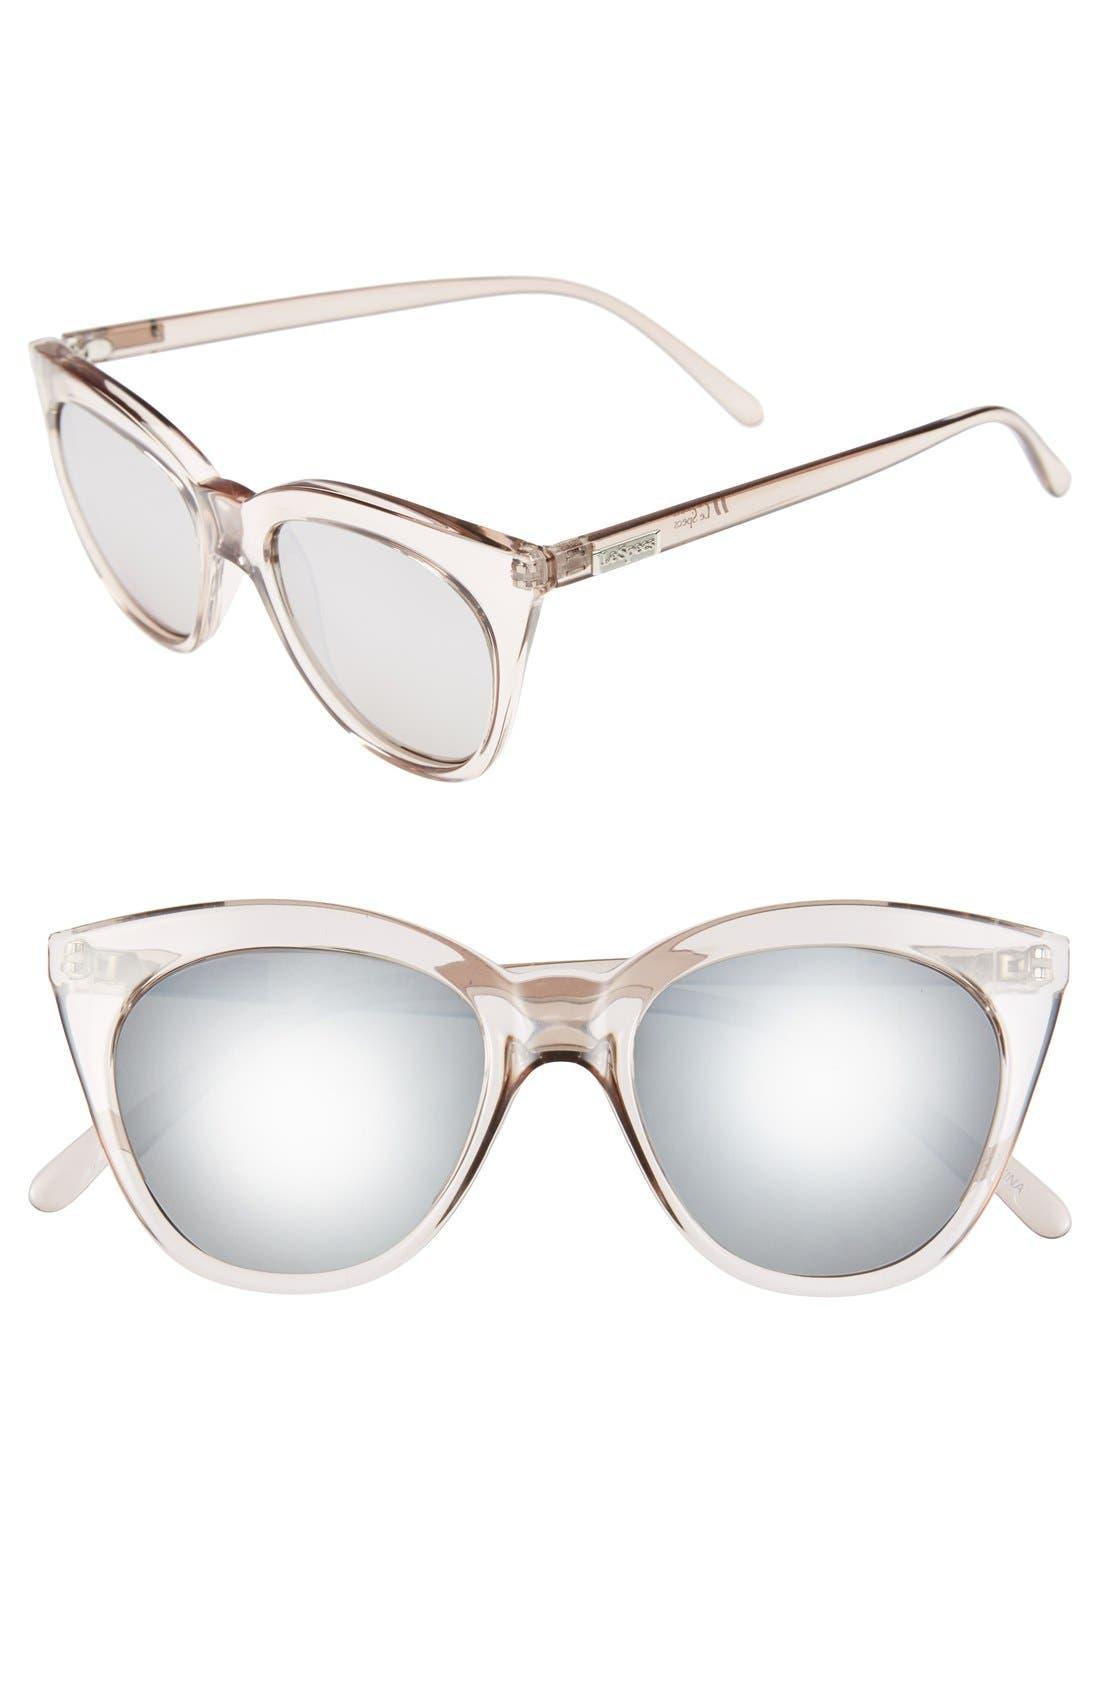 Halfmoon Magic 51mm Cat Eye Sunglasses,                             Main thumbnail 1, color,                             STONE/ SILVER MIRROR